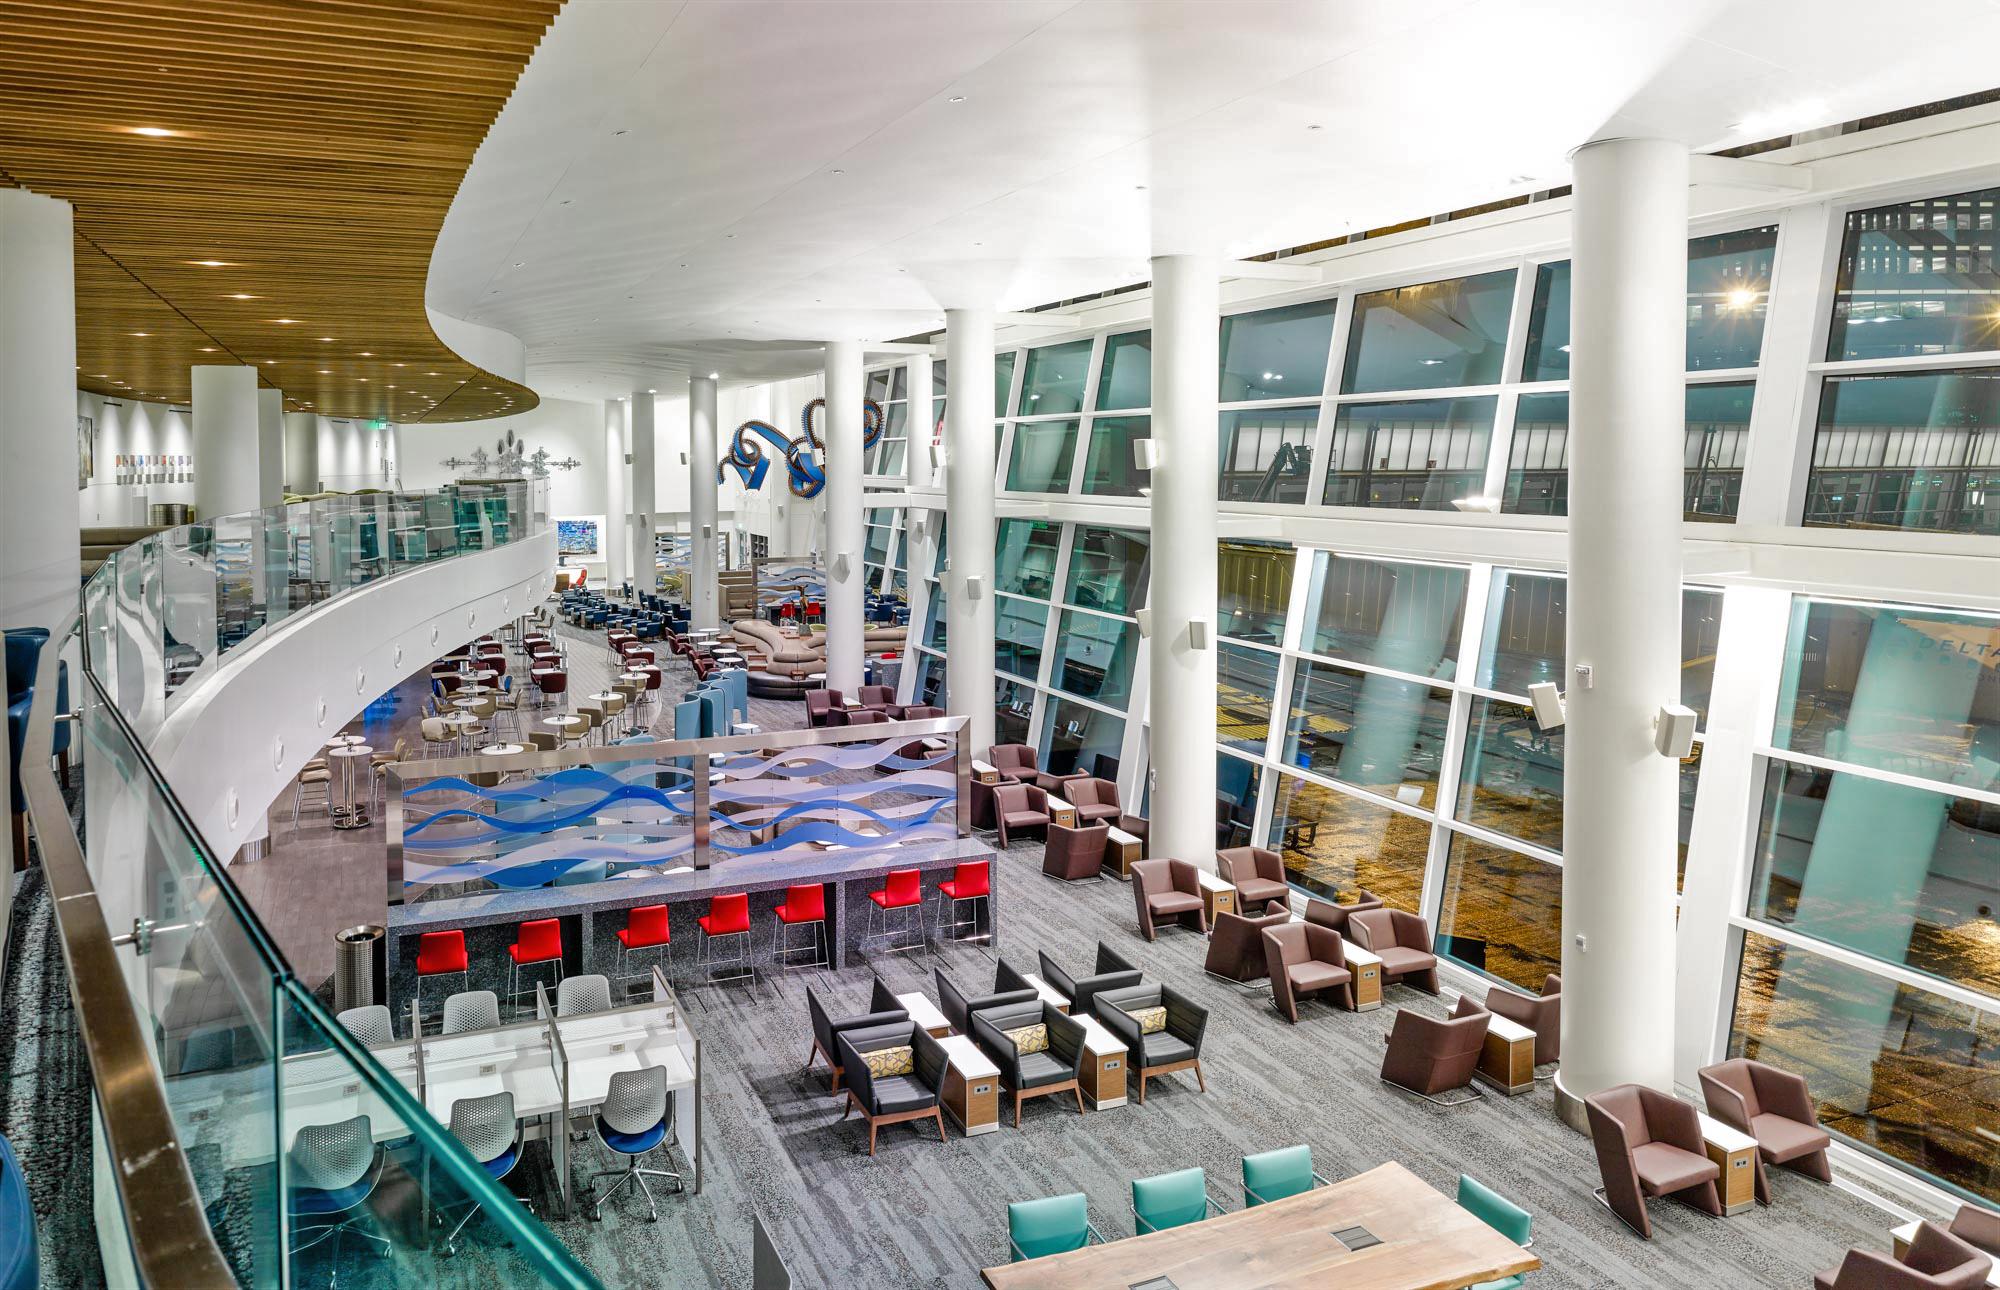 Bellevue washington airport - South seas island captiva